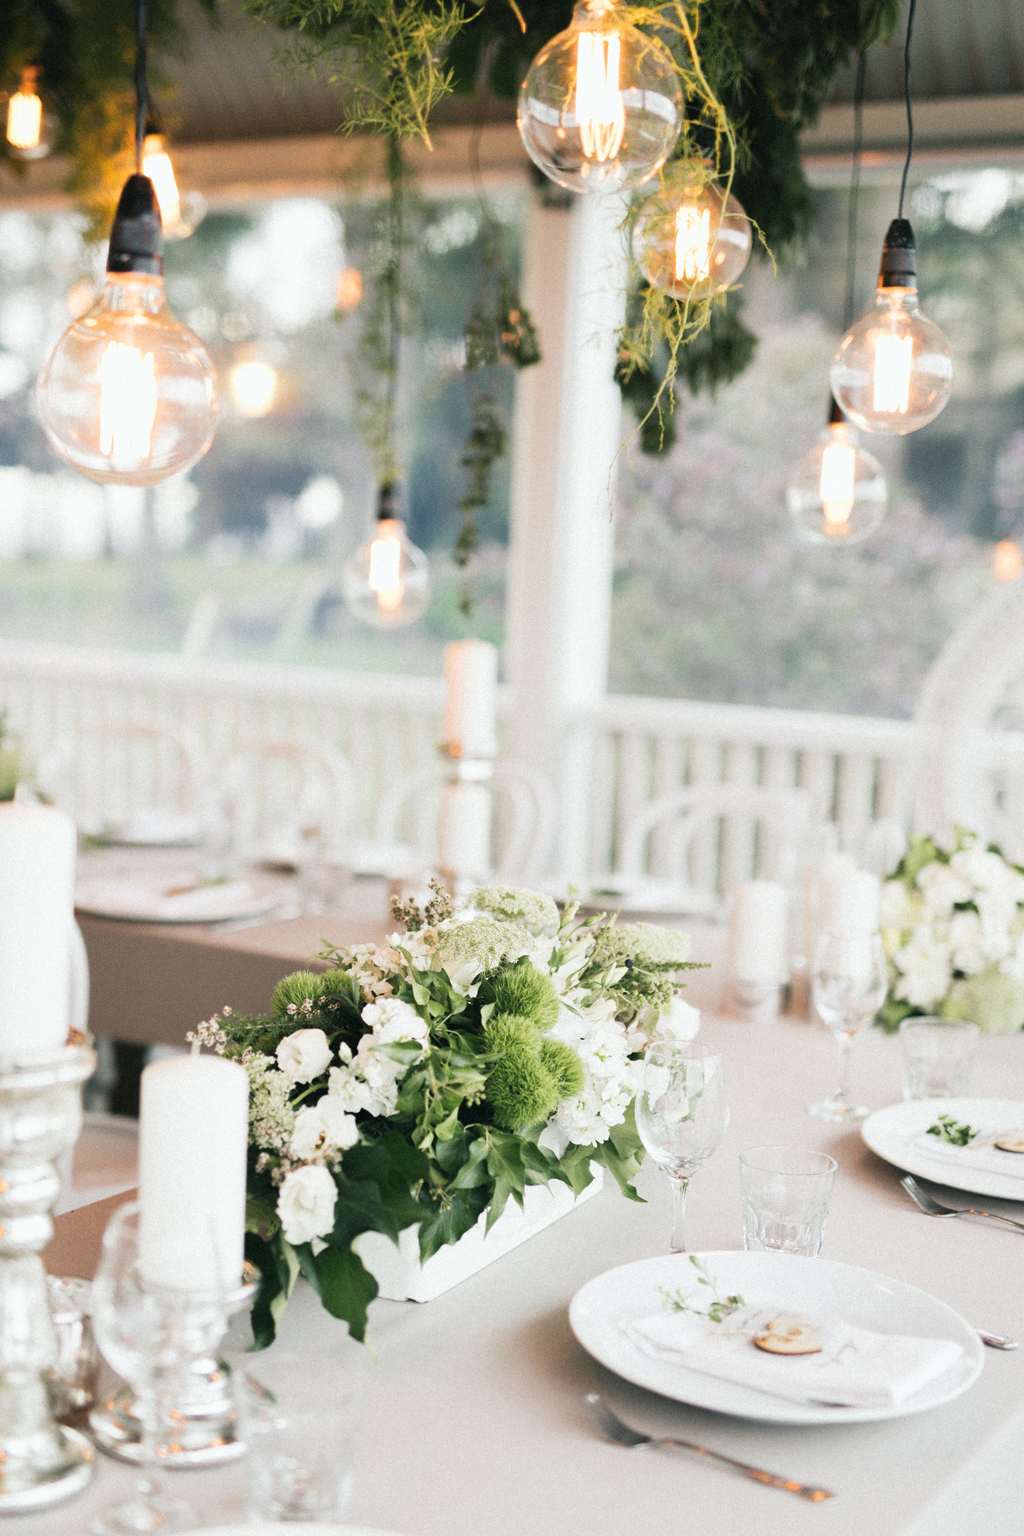 Byron Bay Wedding Photographer - Carly Tia Photography52.jpg